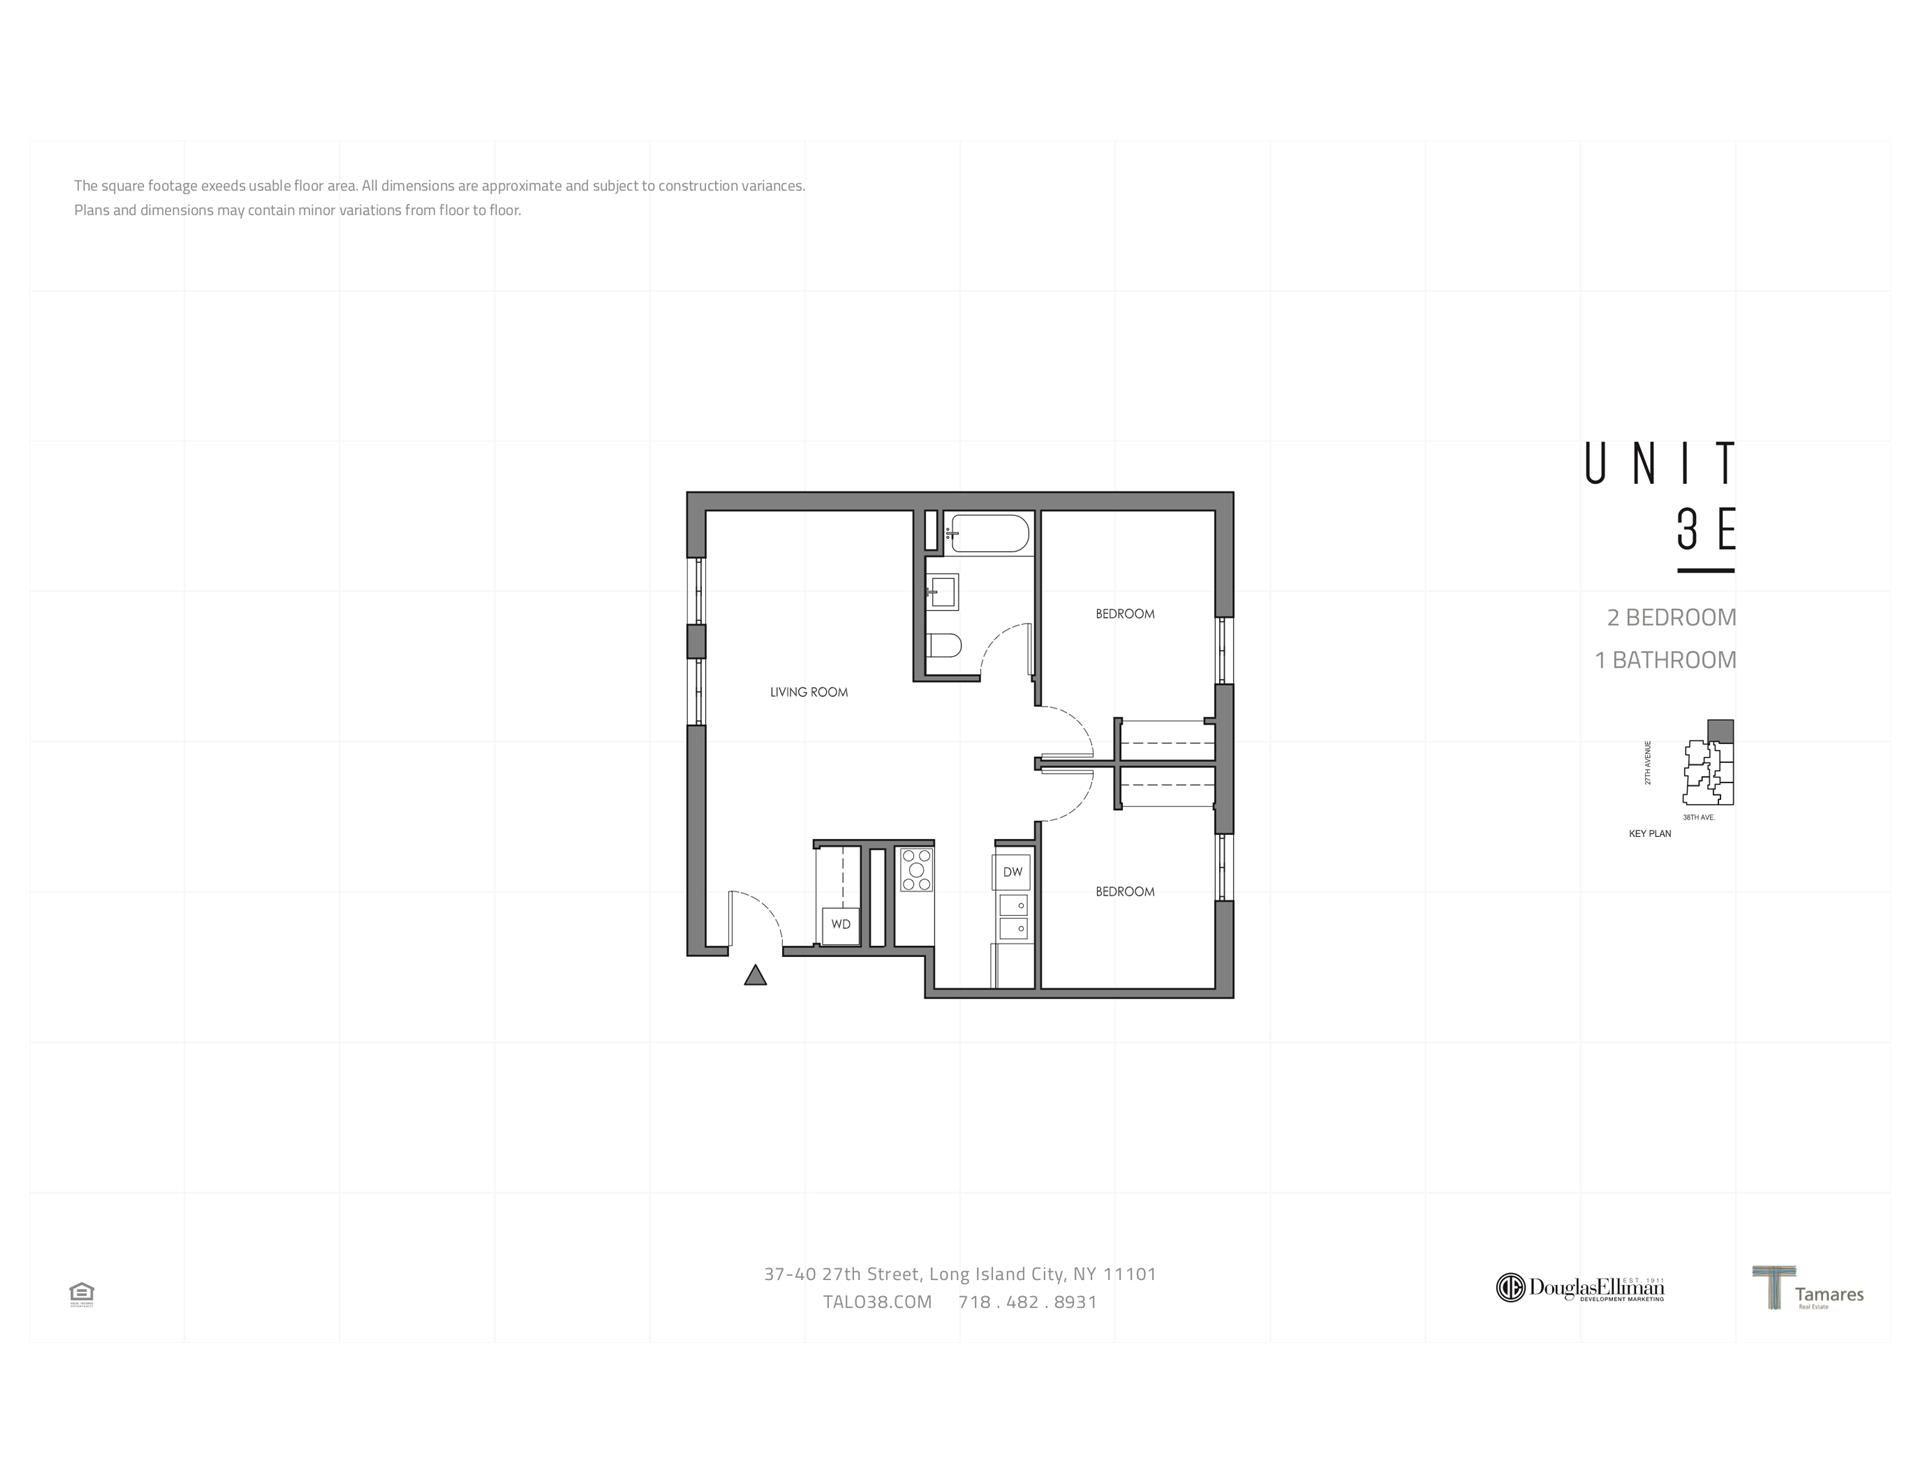 Floor plan of 37-40 27th St, 3E - Long Island City, New York